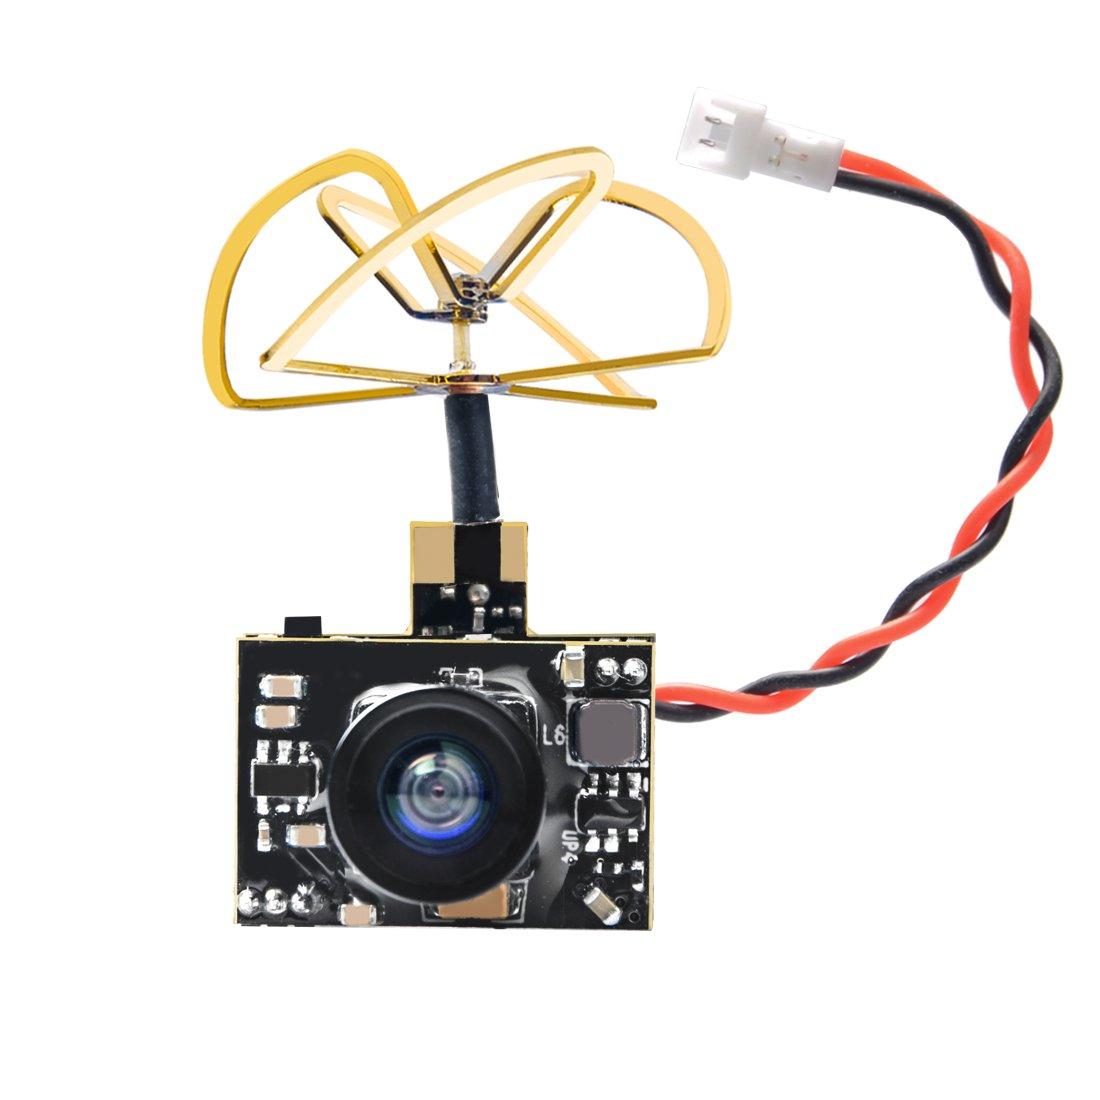 AKK A2 5.8Ghz 200mW FPV Transmitter Raceband 600TVL 1/4 Cmos Mini FPV Micro AIO Camera with Clover Antenna for FPV Drone